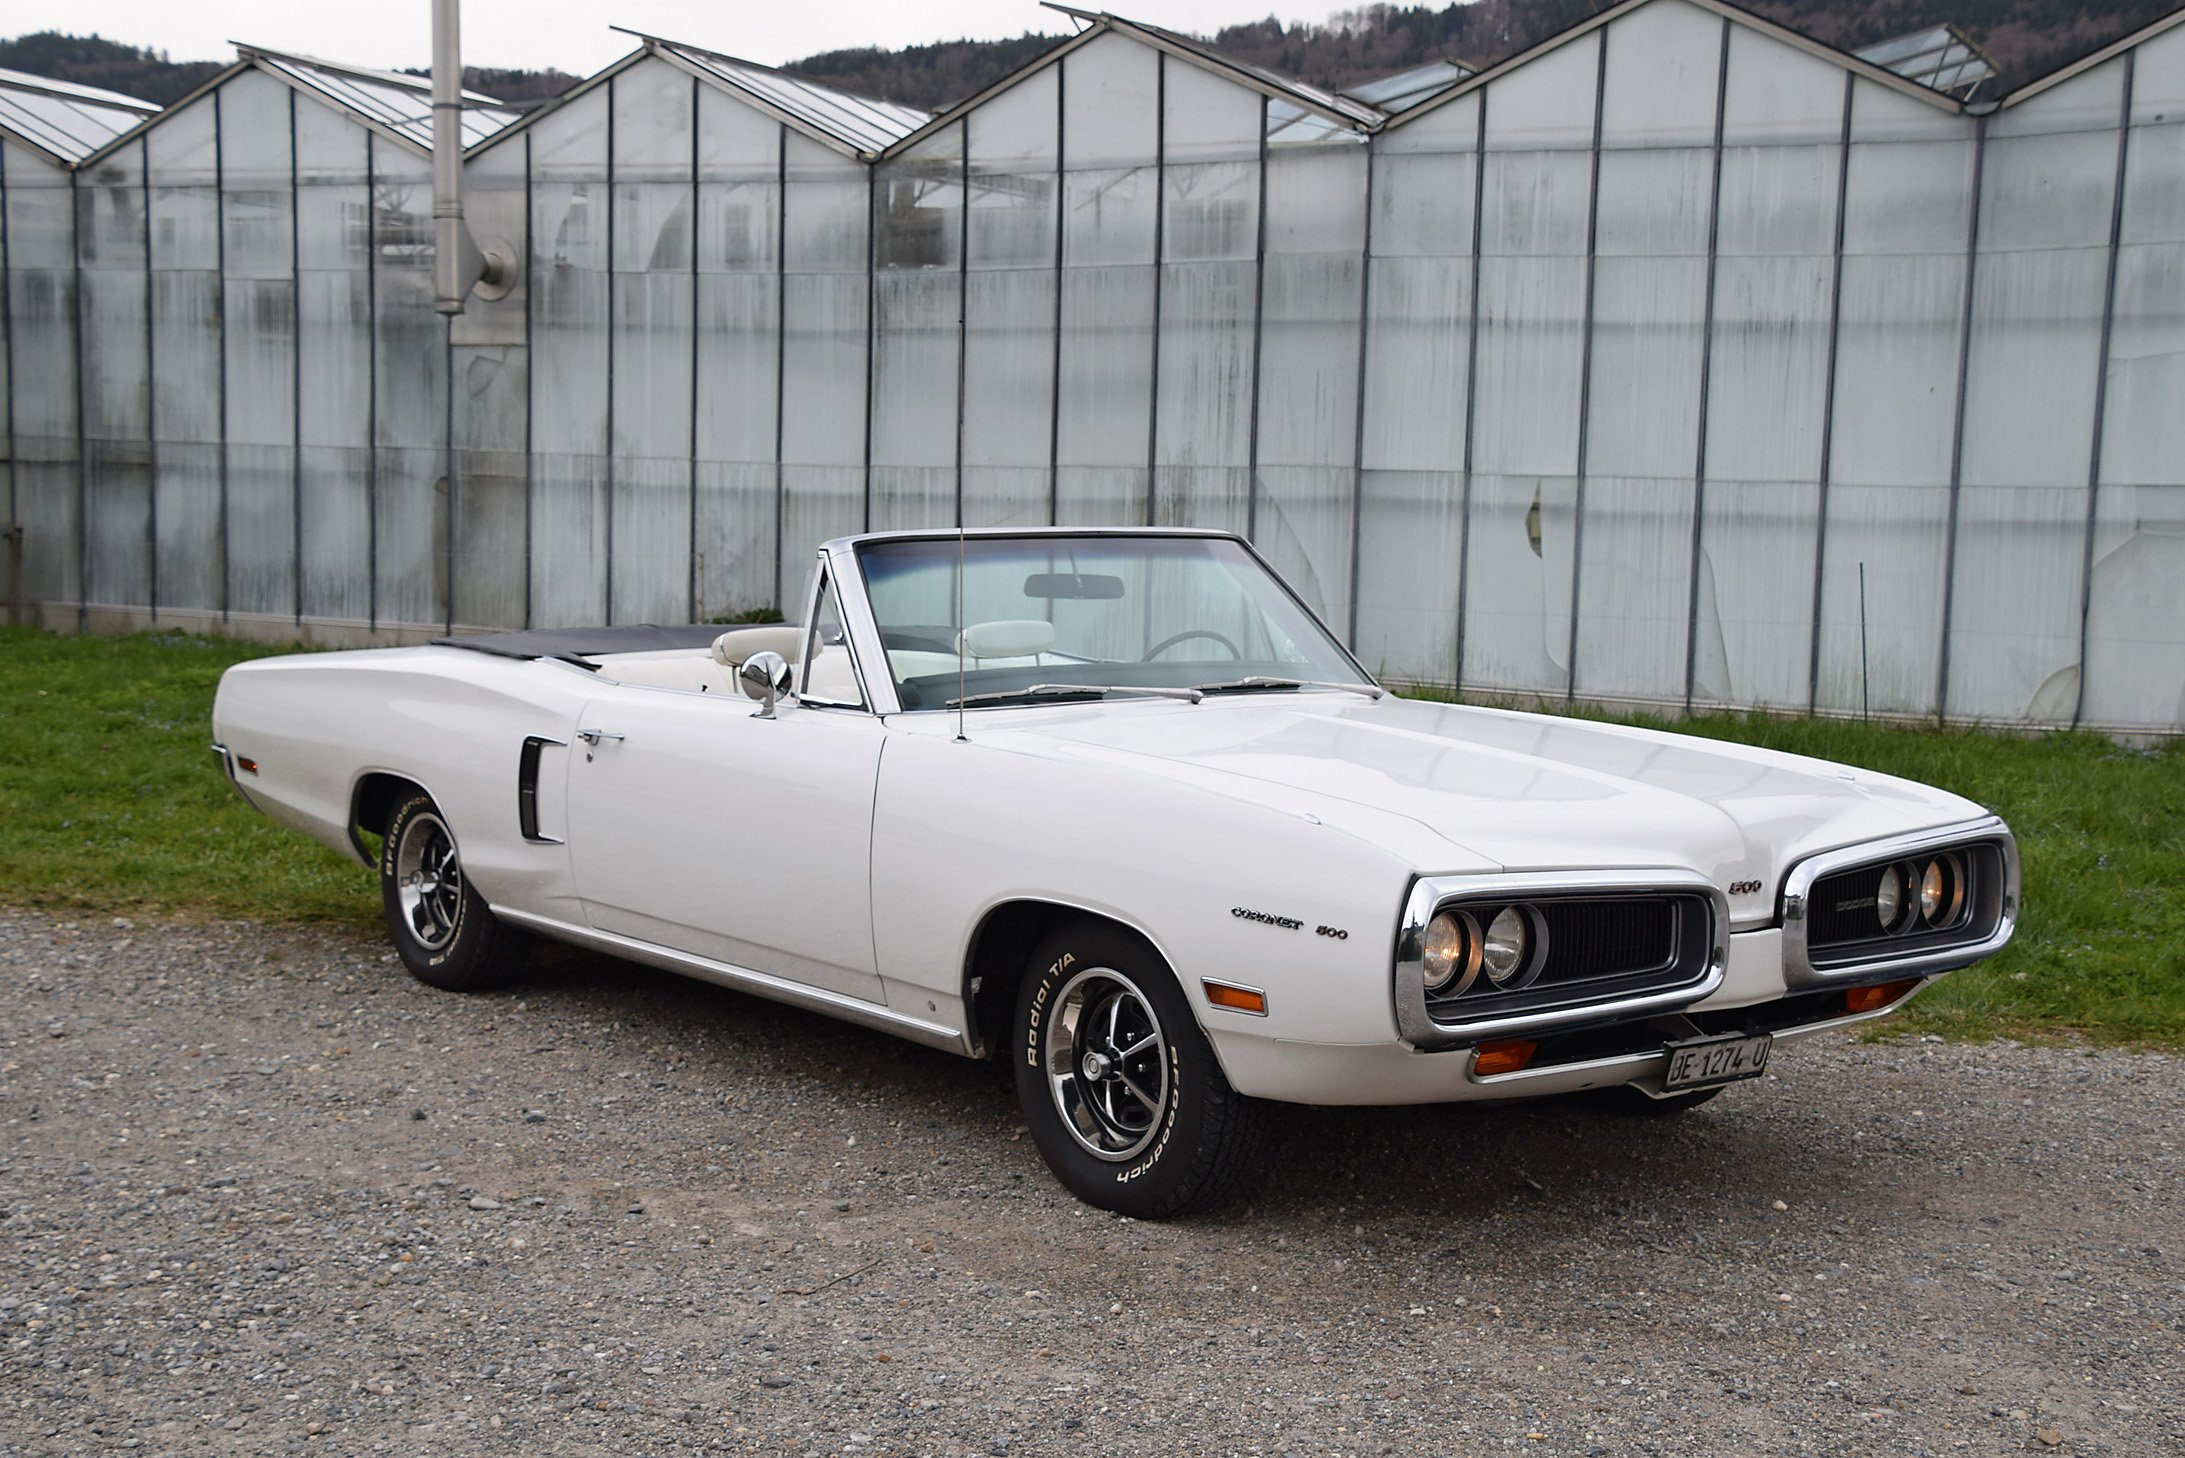 1970 Dodge Coronet 500 Convertible Cars Classic Wallpaper 2185x1458 950780 Wallpaperup